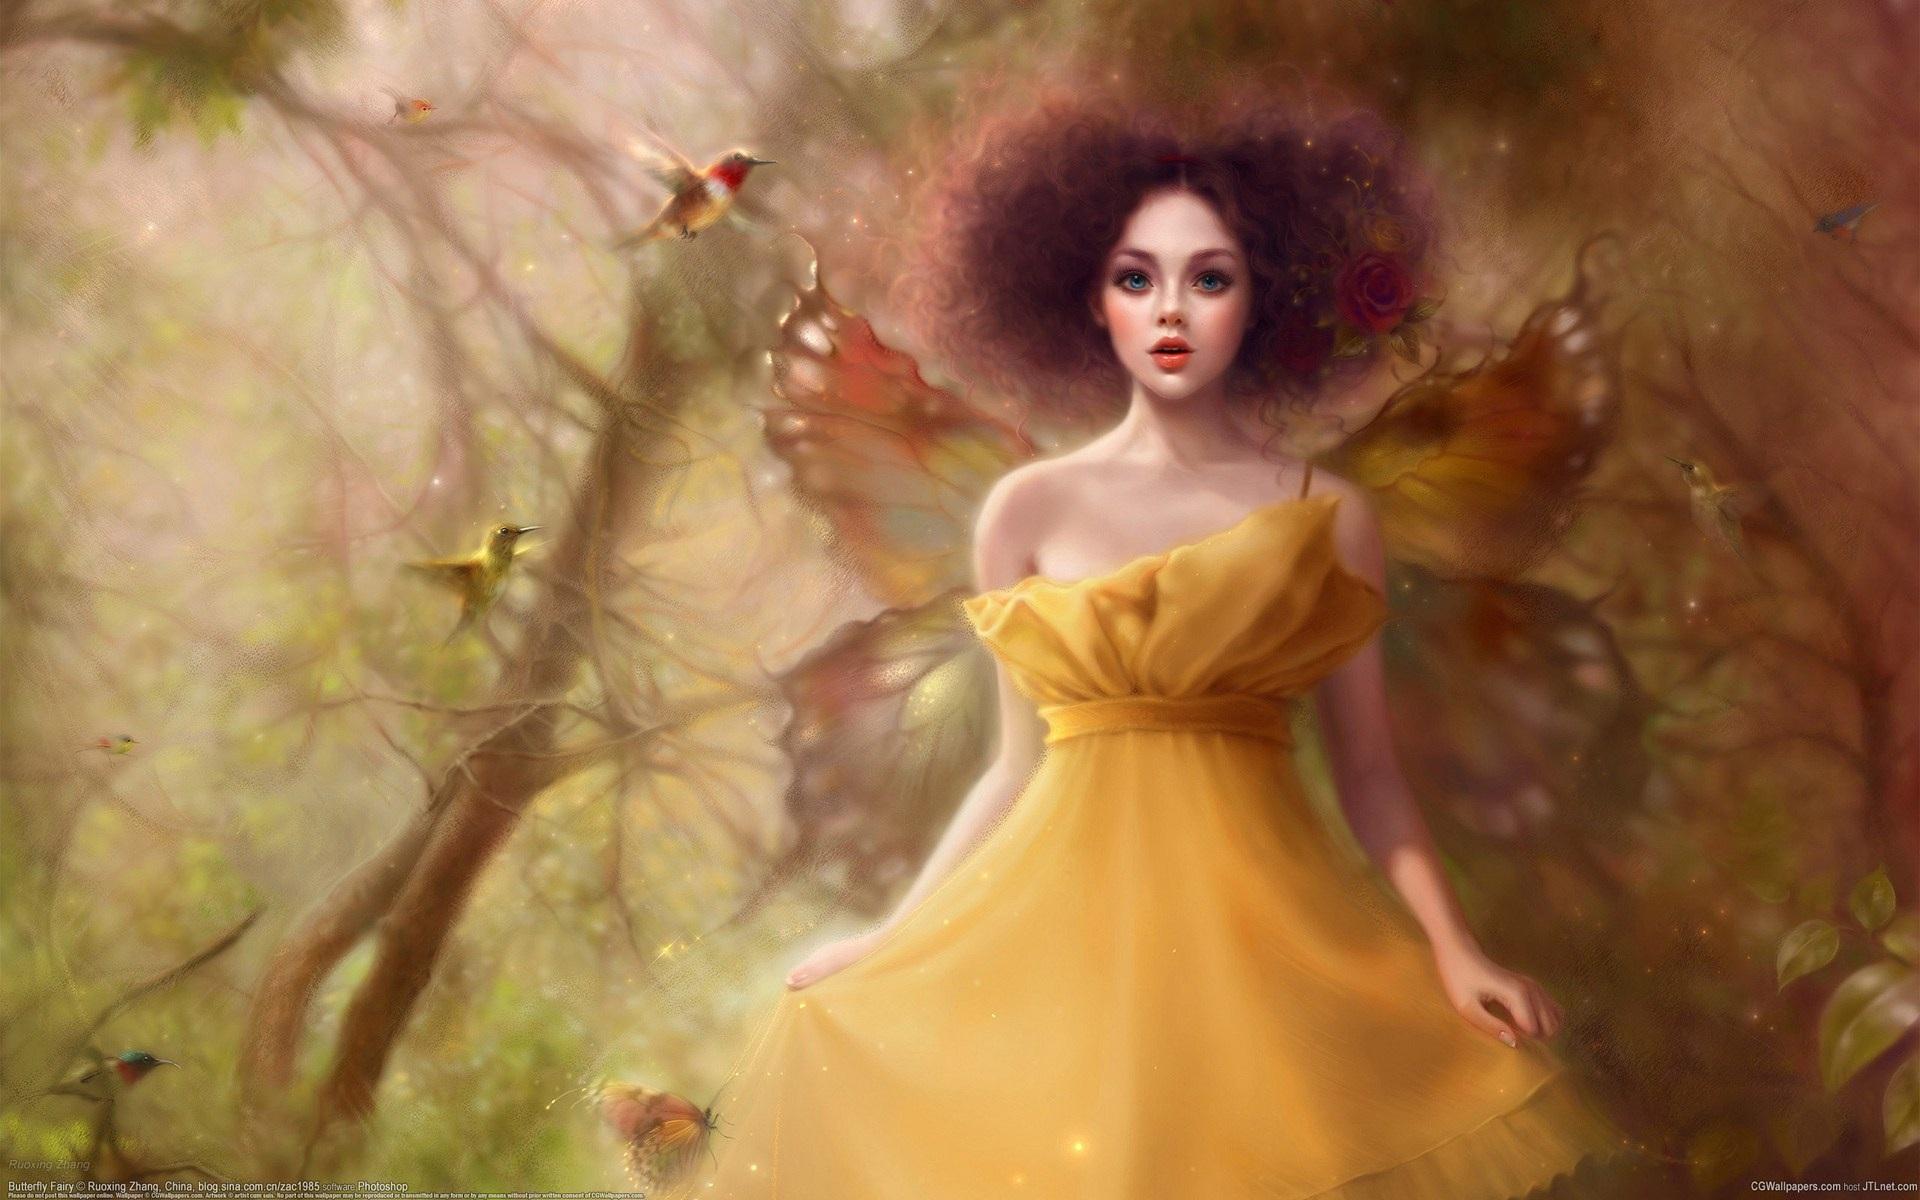 Желтая юбка крылья бабочки девушки